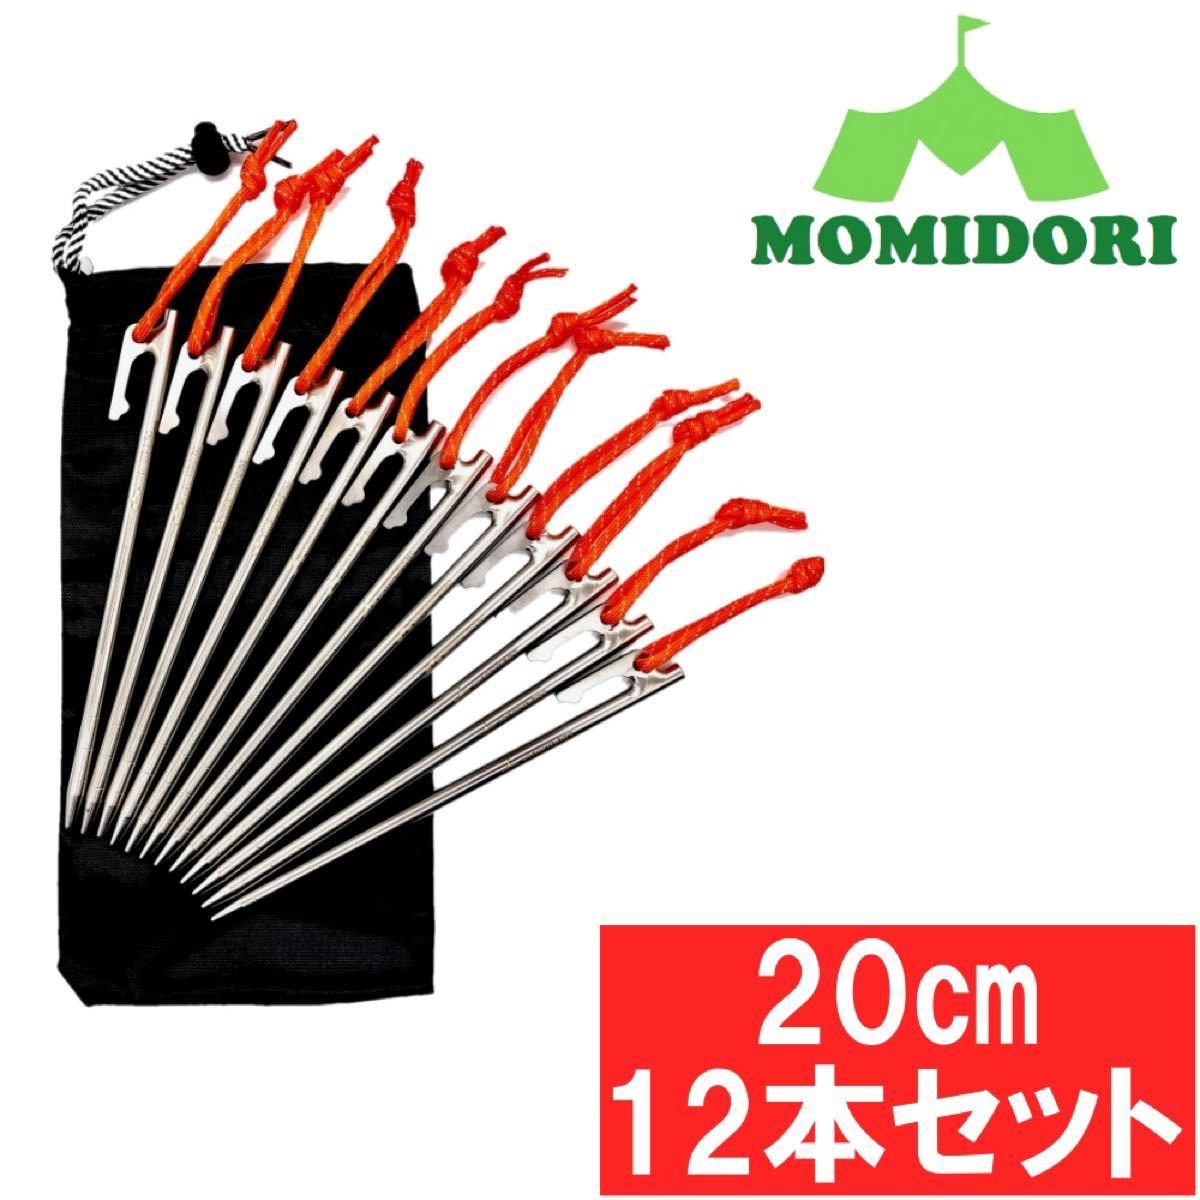 MOMIDORIチタンペグ 夜光固定ロープ/収納袋付き  20cm 12本セット